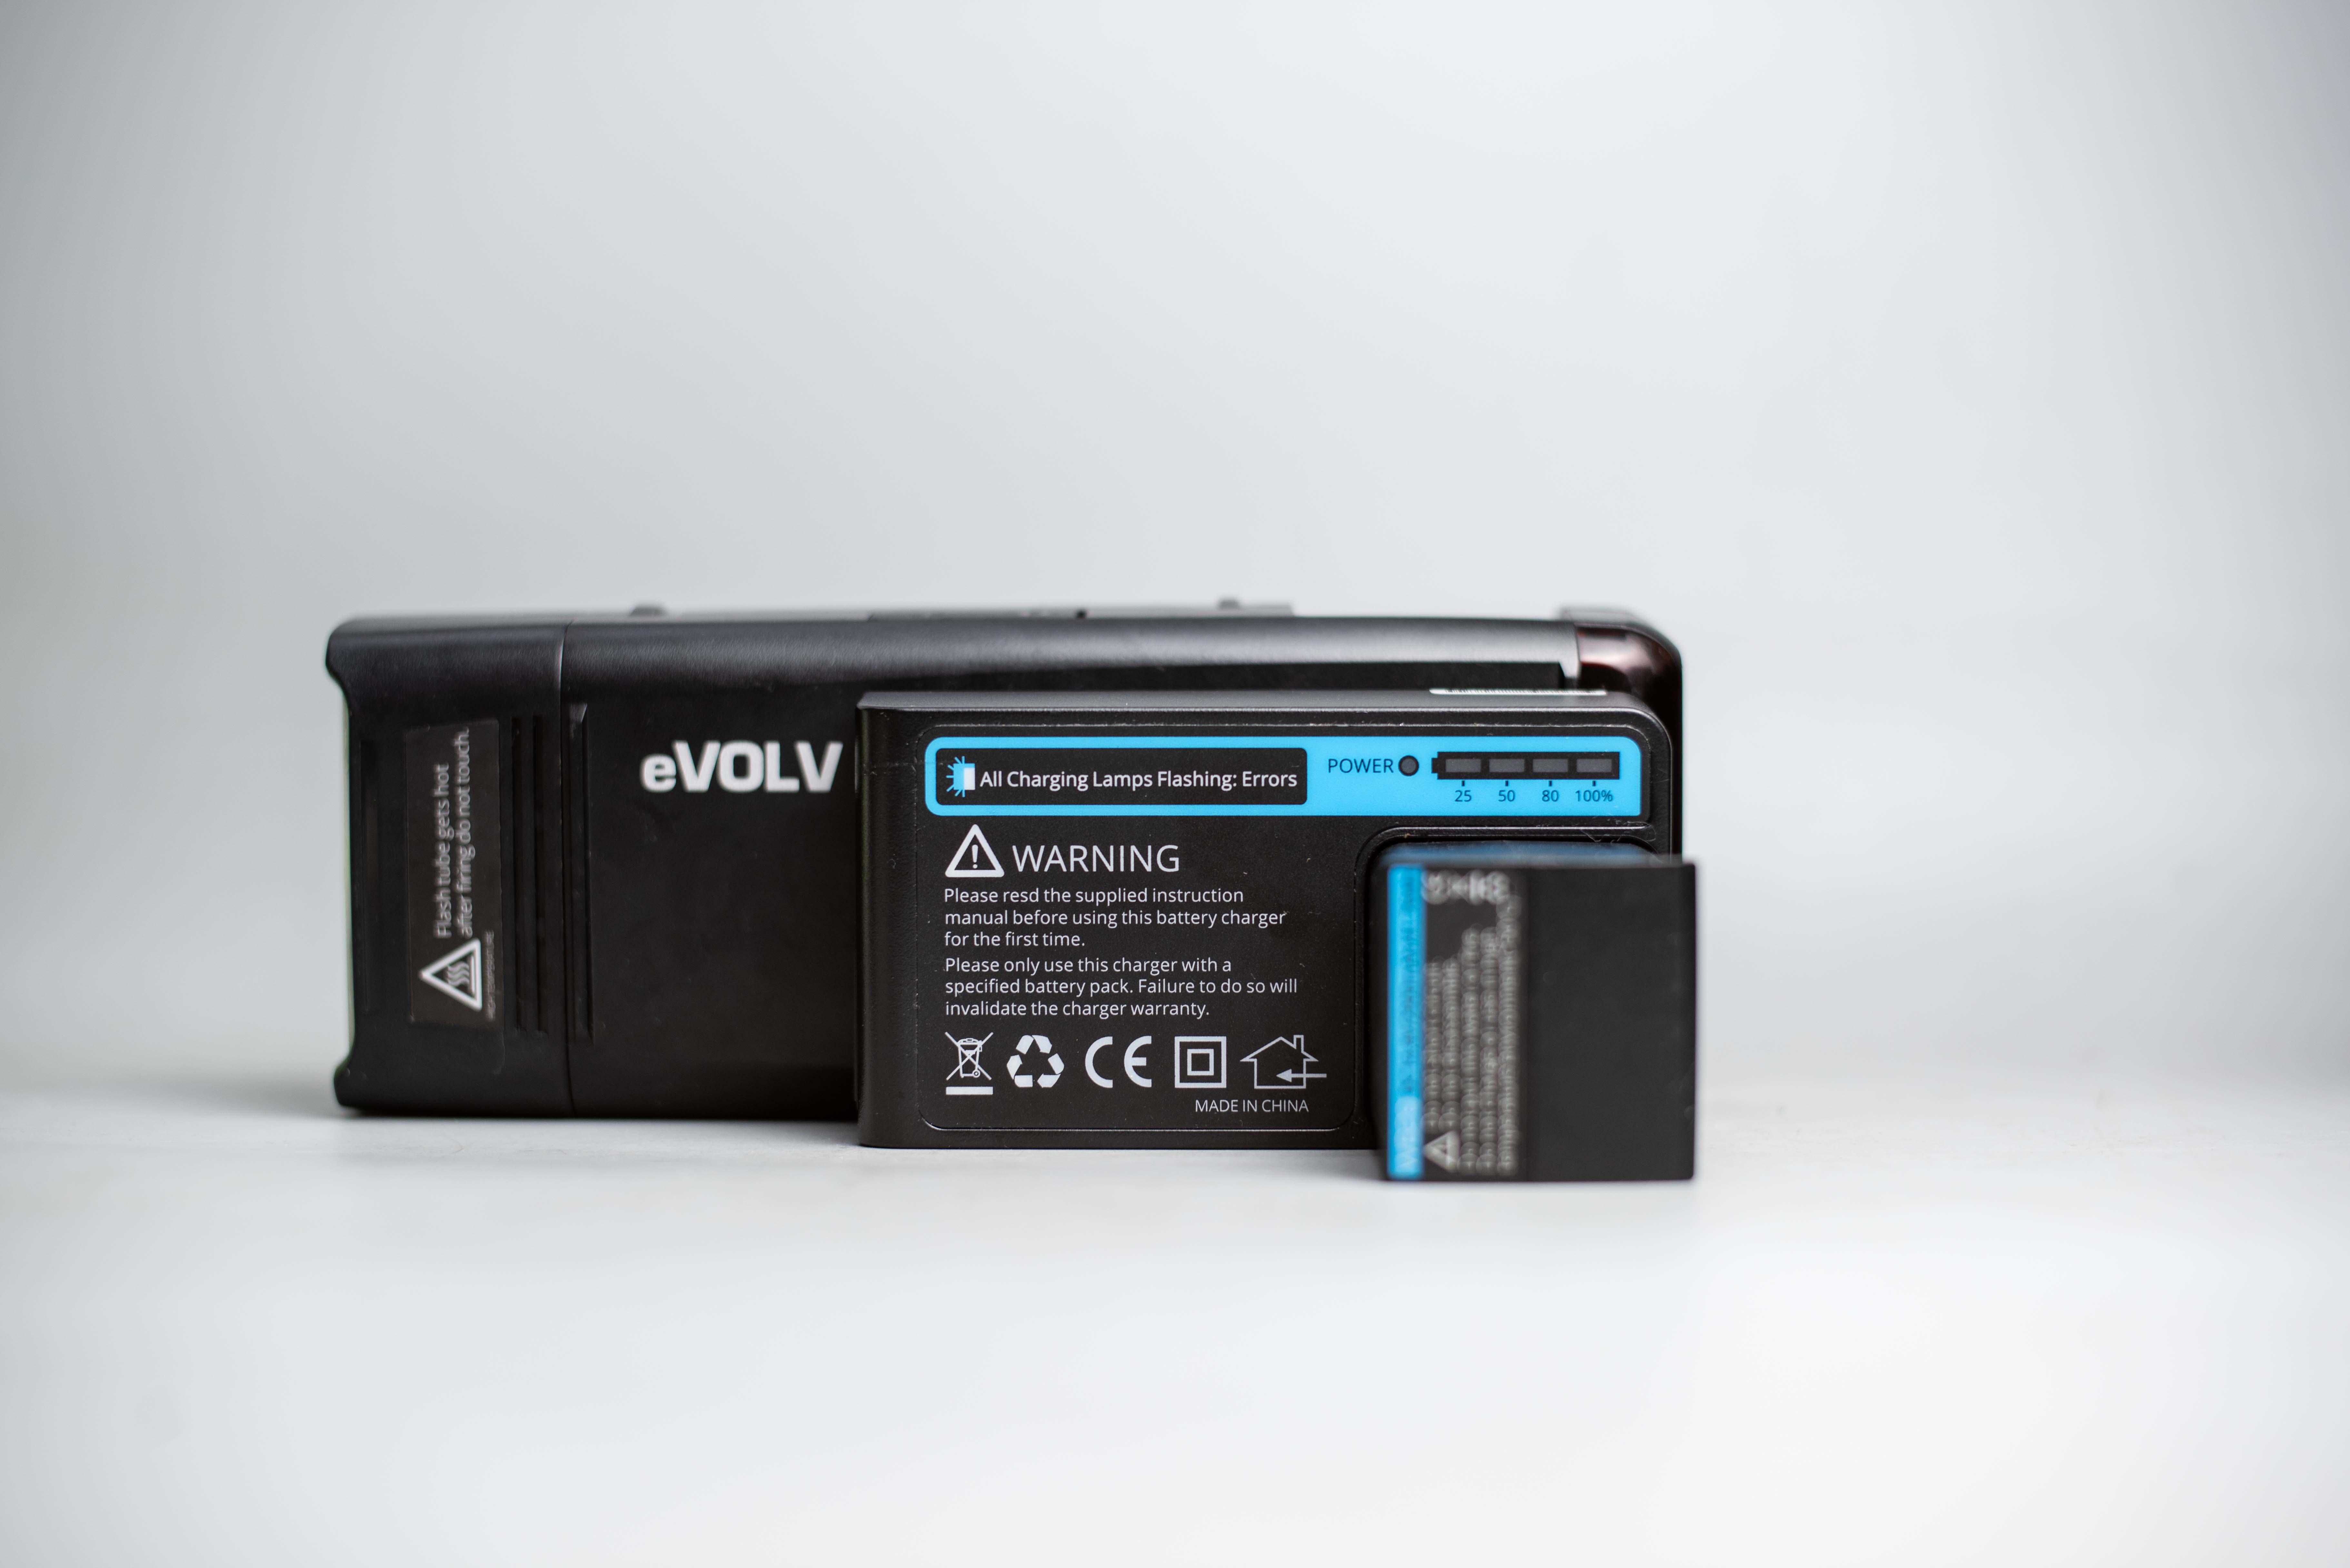 flashpoint-evolv-200-r2-ttl-pocket-flash-godox-ad200-18737